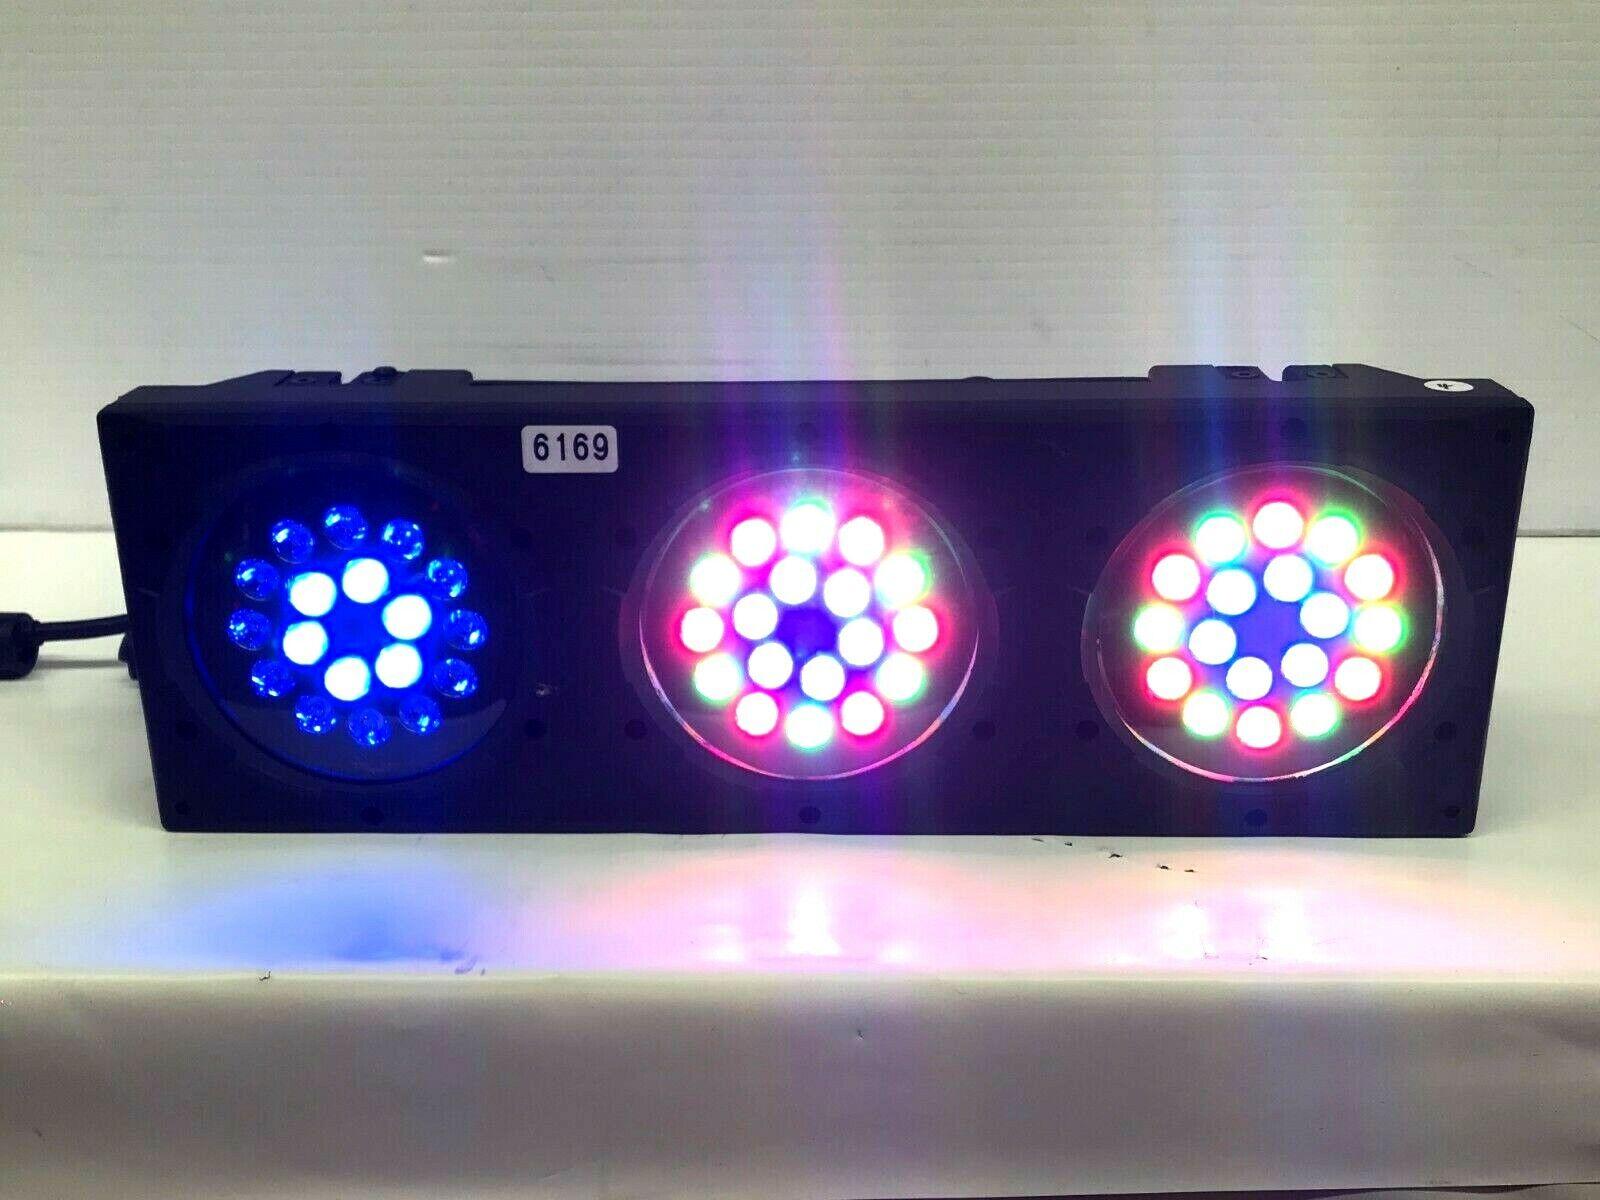 CHAUVET FarbeADO 3 LED LIGHT  6169 (ONE)